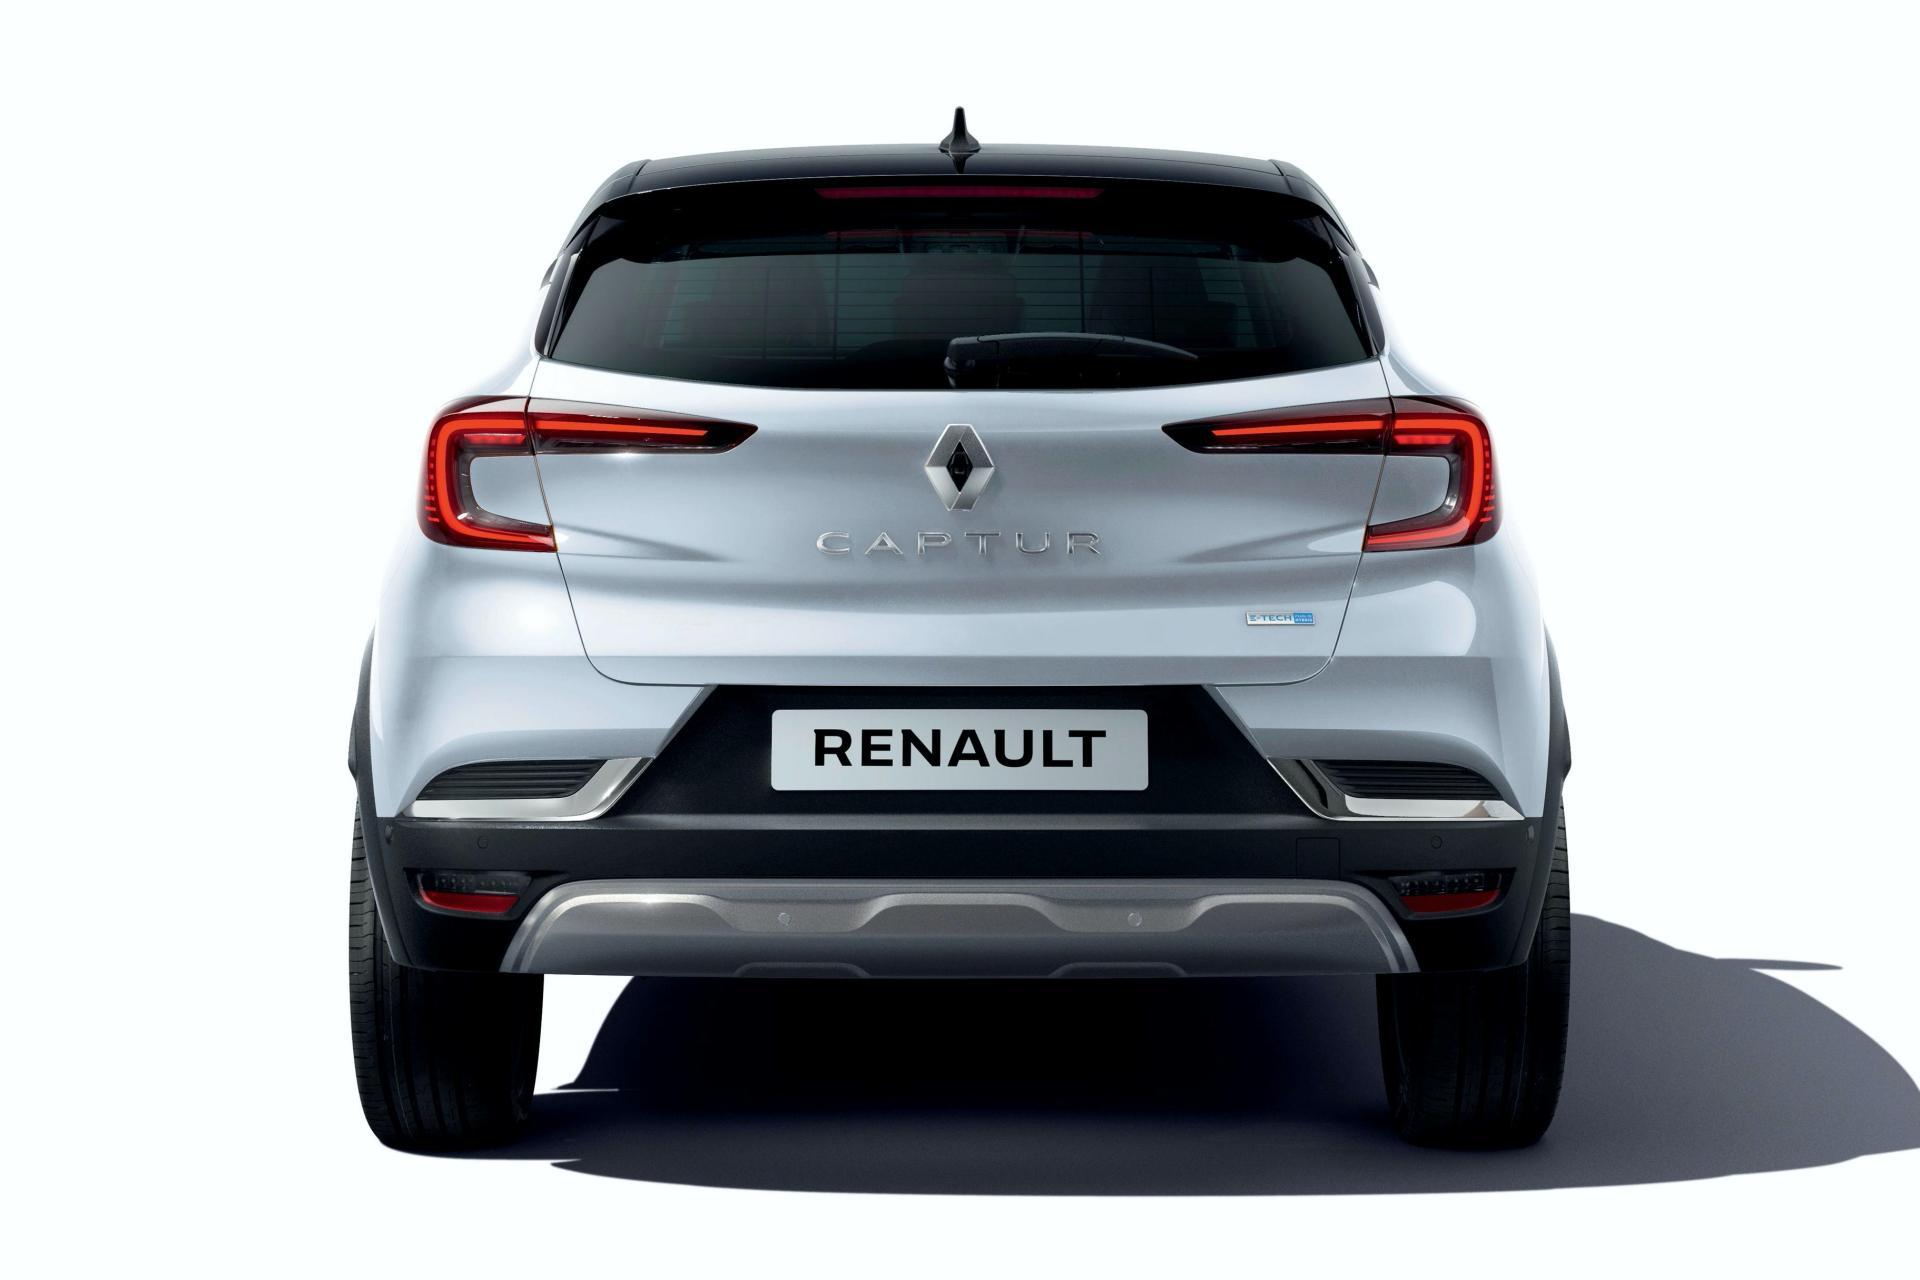 2020-Renault-Captur-E-Tech-plug-in-hybrid-9